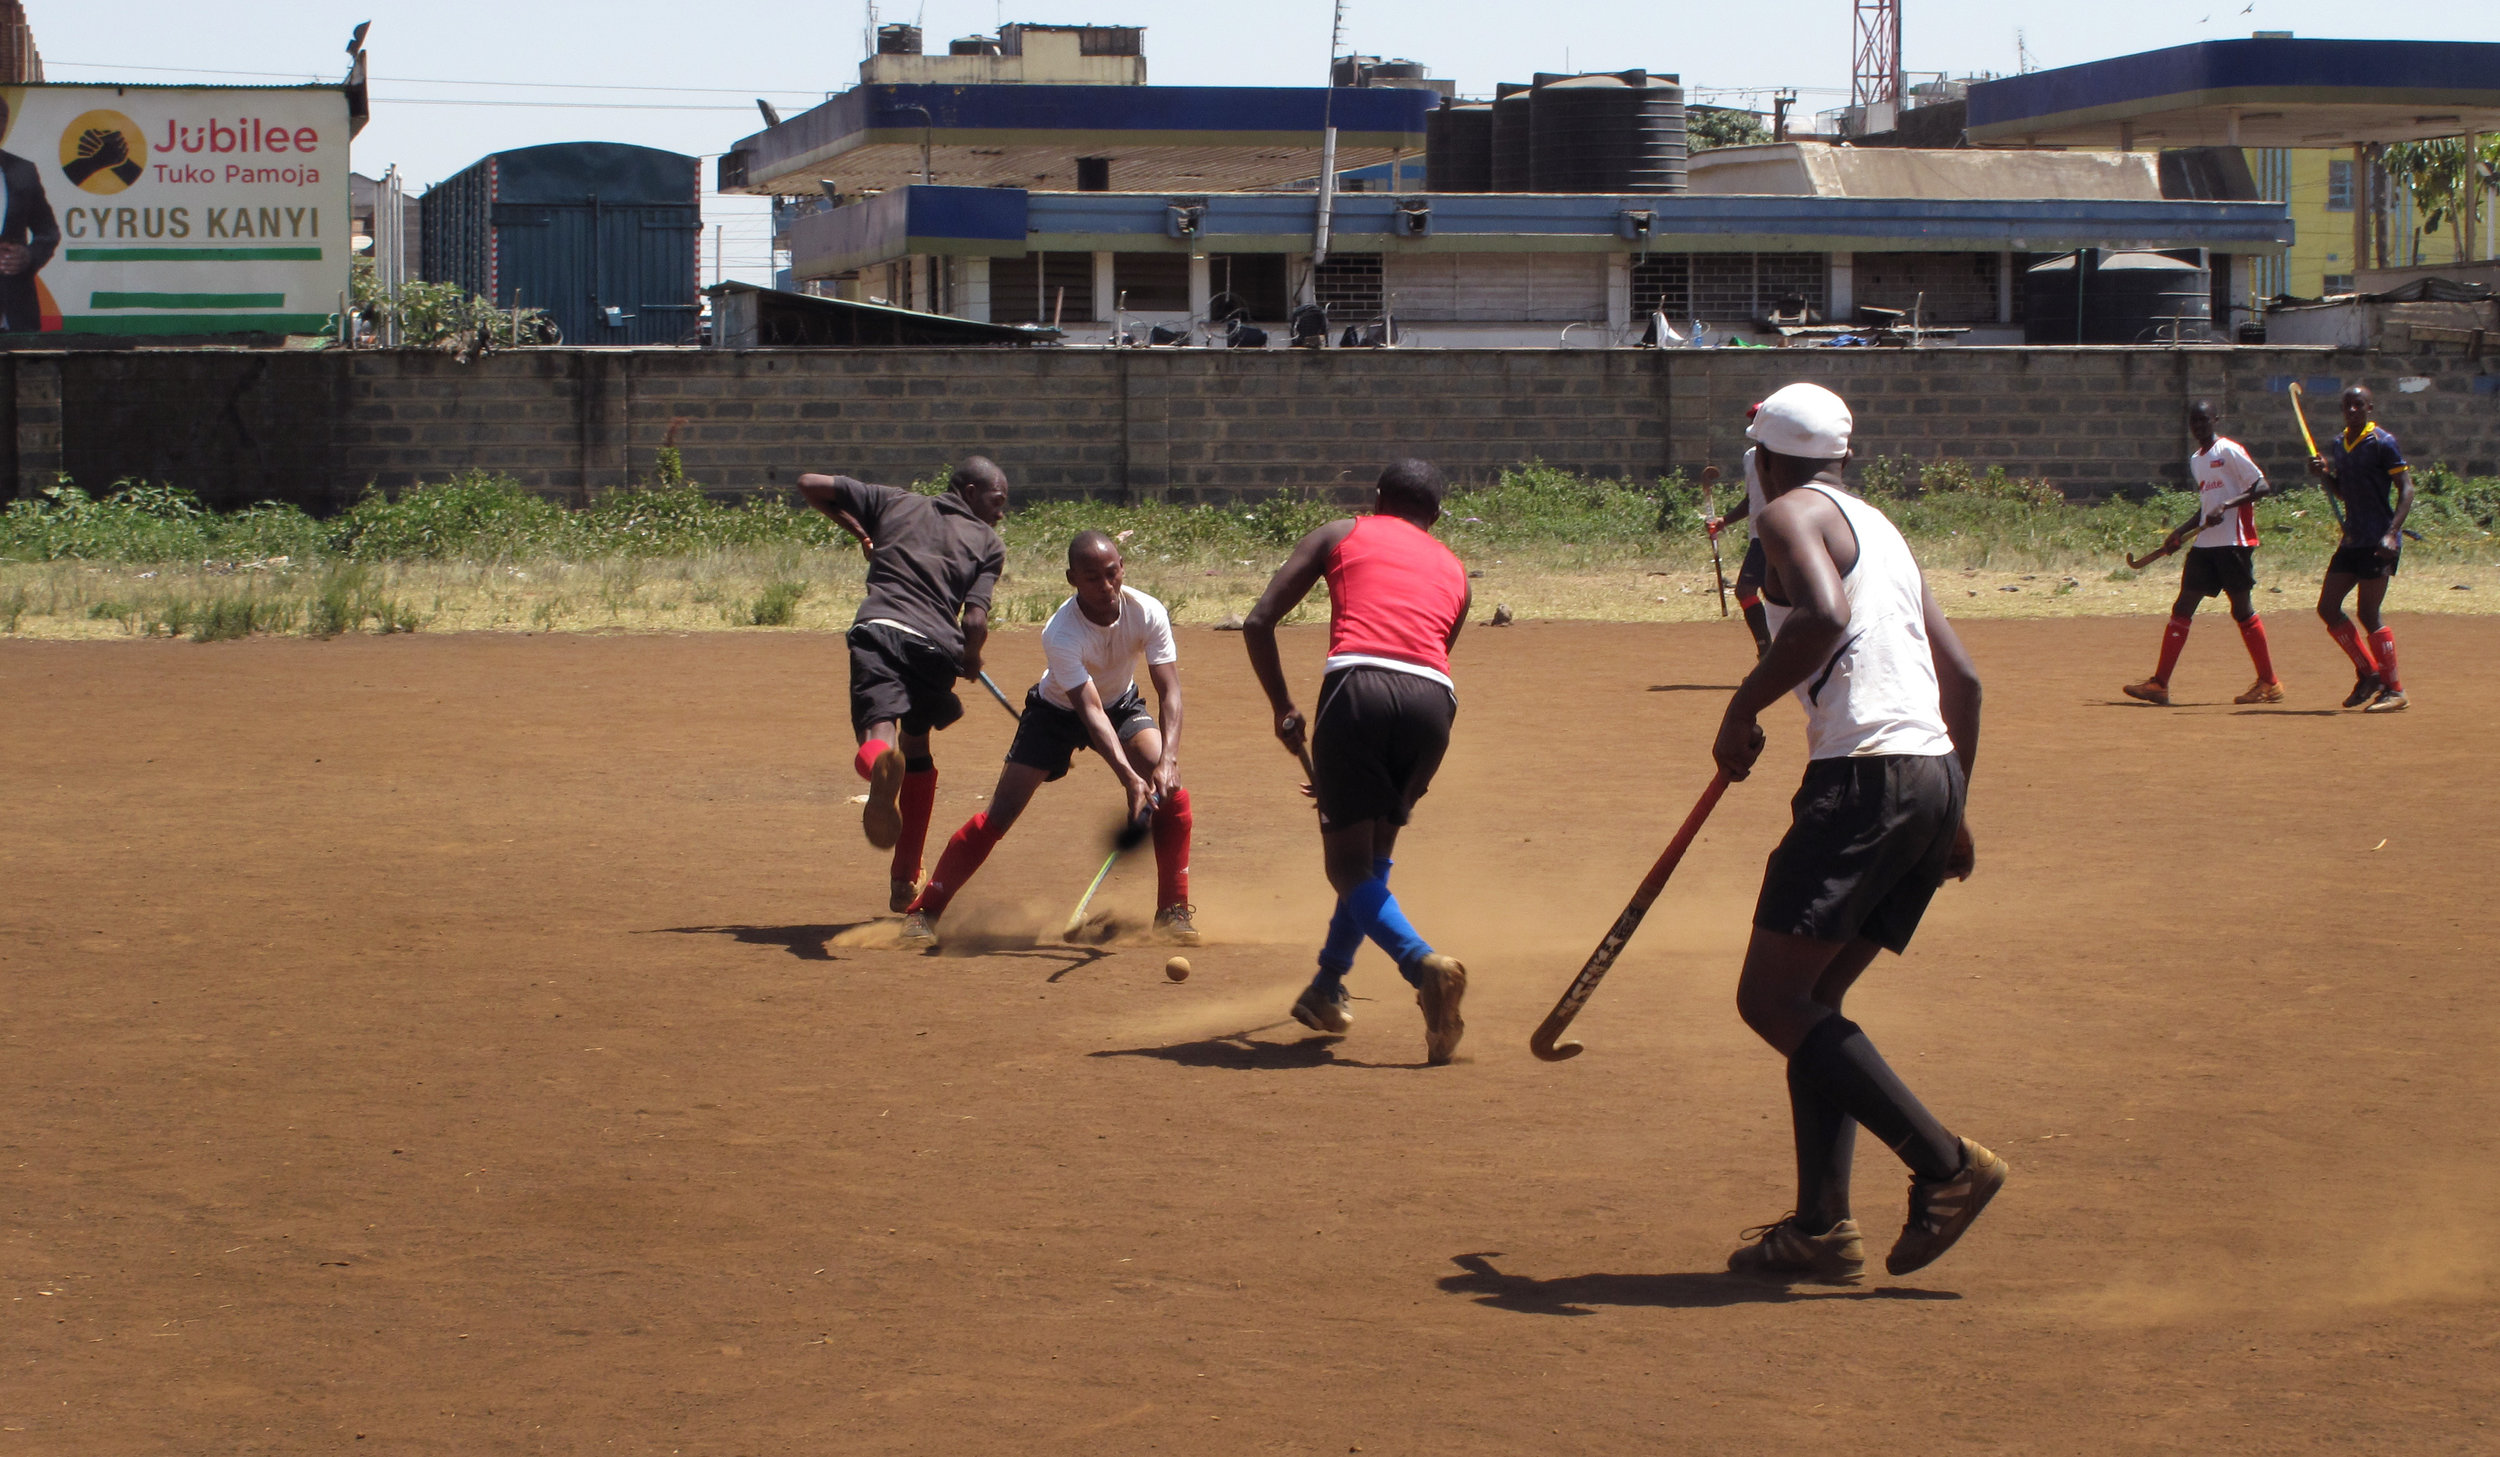 Nairobi_0033.JPG